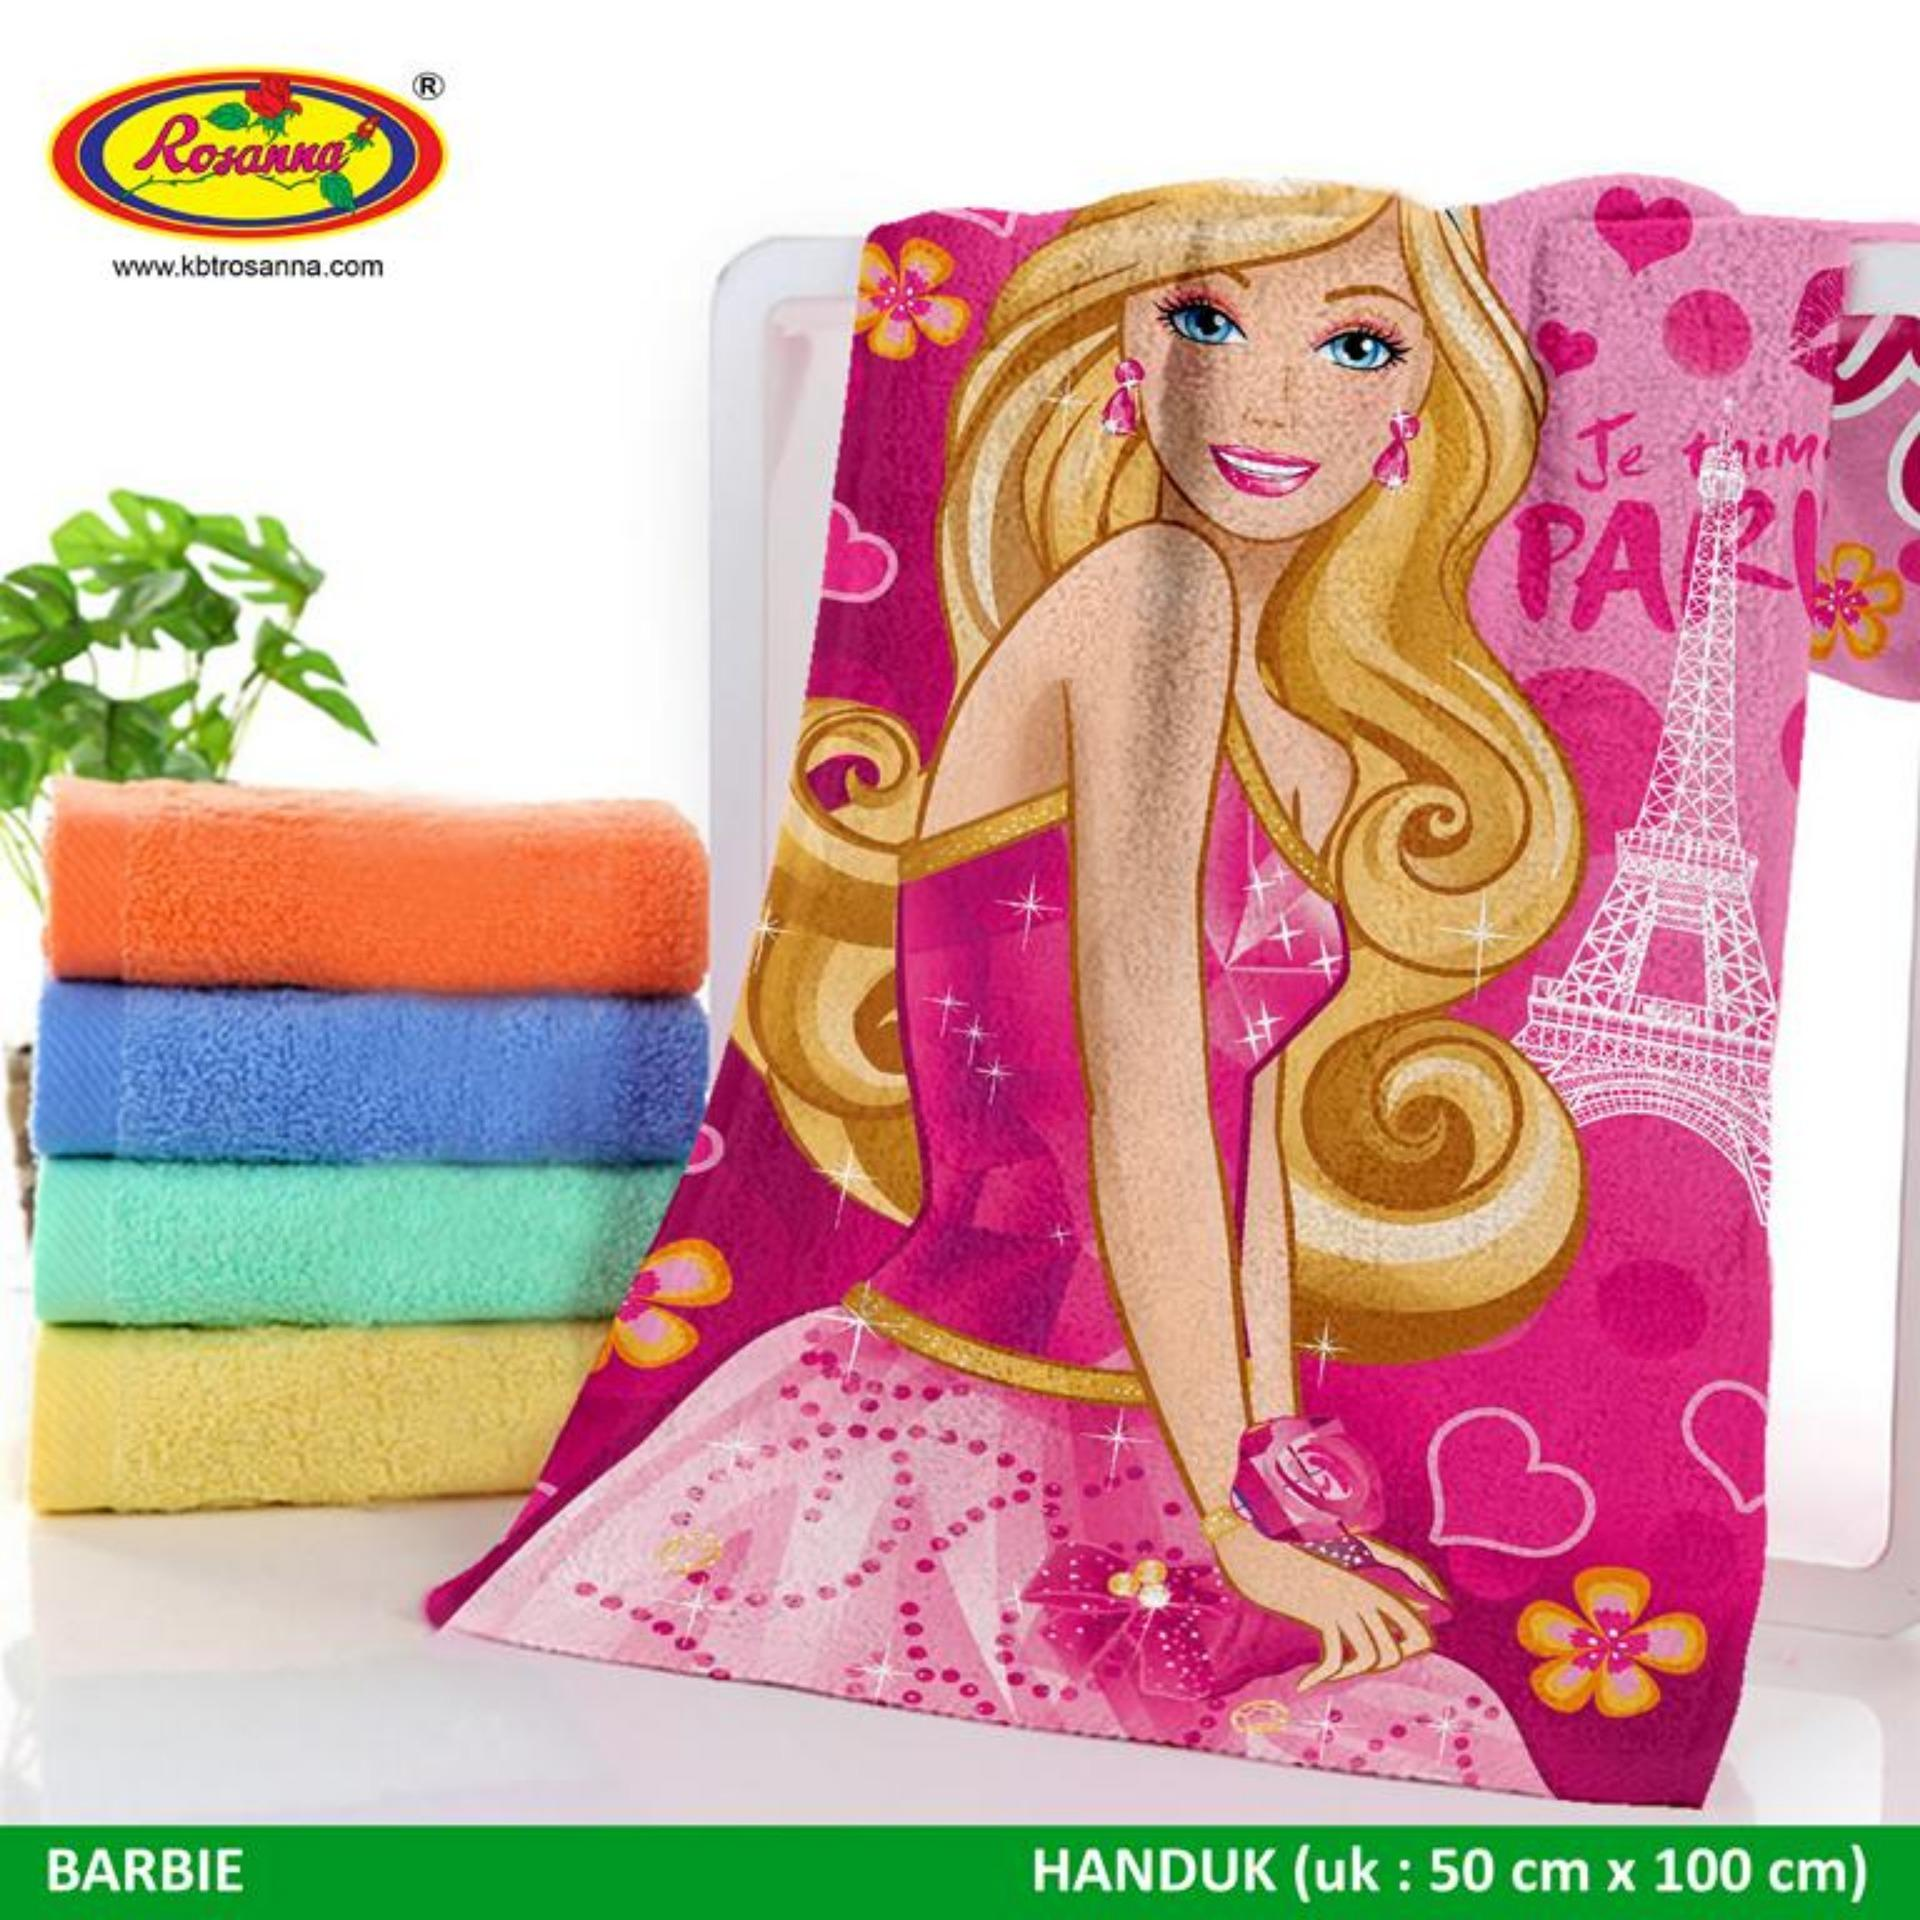 Jual Barbie B1016 Murah Garansi Dan Berkualitas Id Store Bb Kids Liquid Soap Party Botol 250 Ml Rp 18000 Handuk Rosanna Printing Panel 50x100 Barbieidr18000 18615 Dress Up